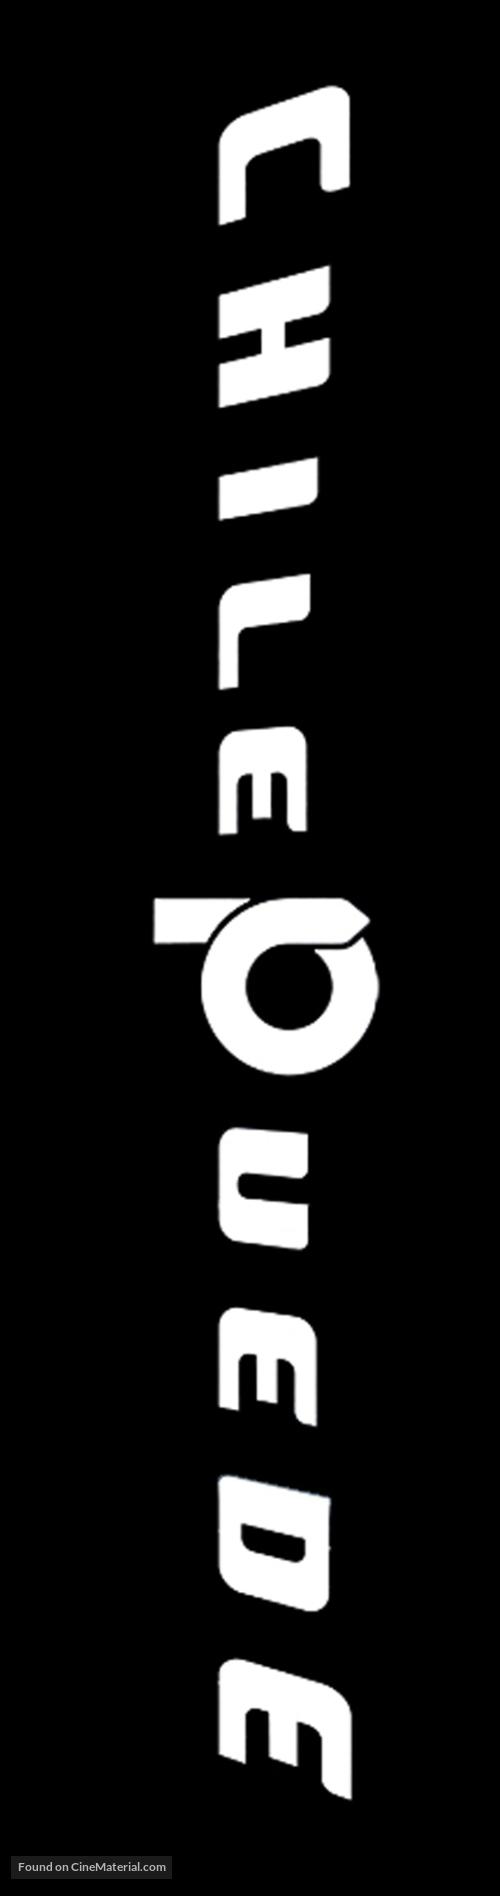 Chile puede - Chilean Logo